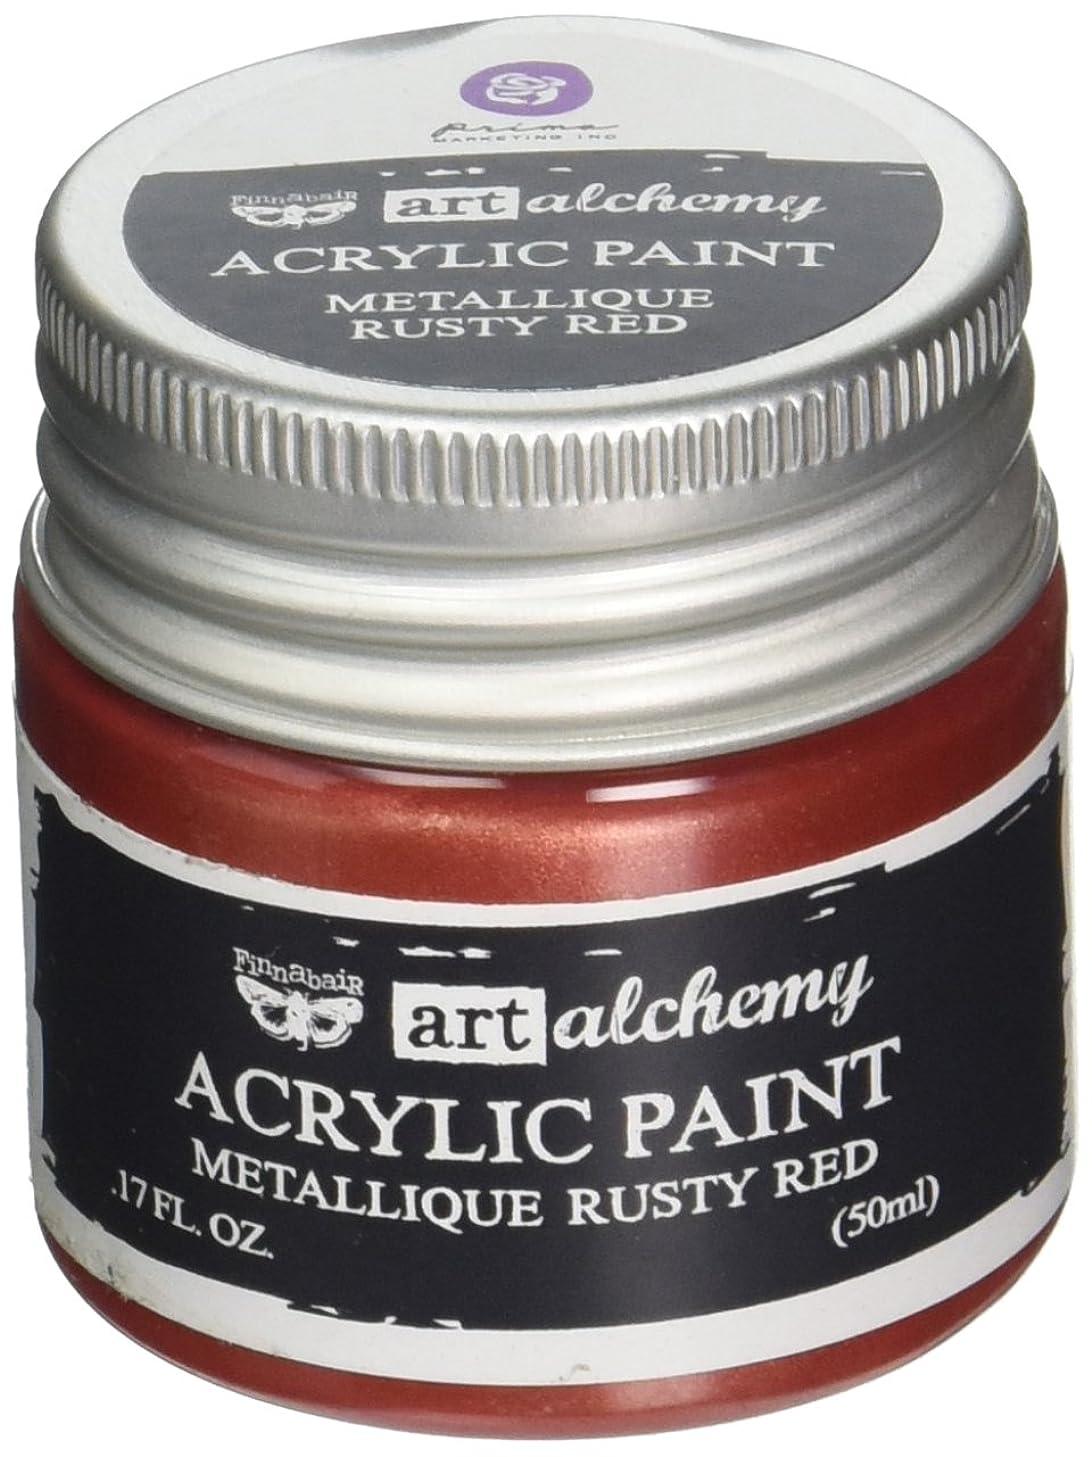 Prima Marketing 963156 Finnabair Art Alchemy Acrylic Paint, 1.7 fl. oz, Metallique Rusty Red